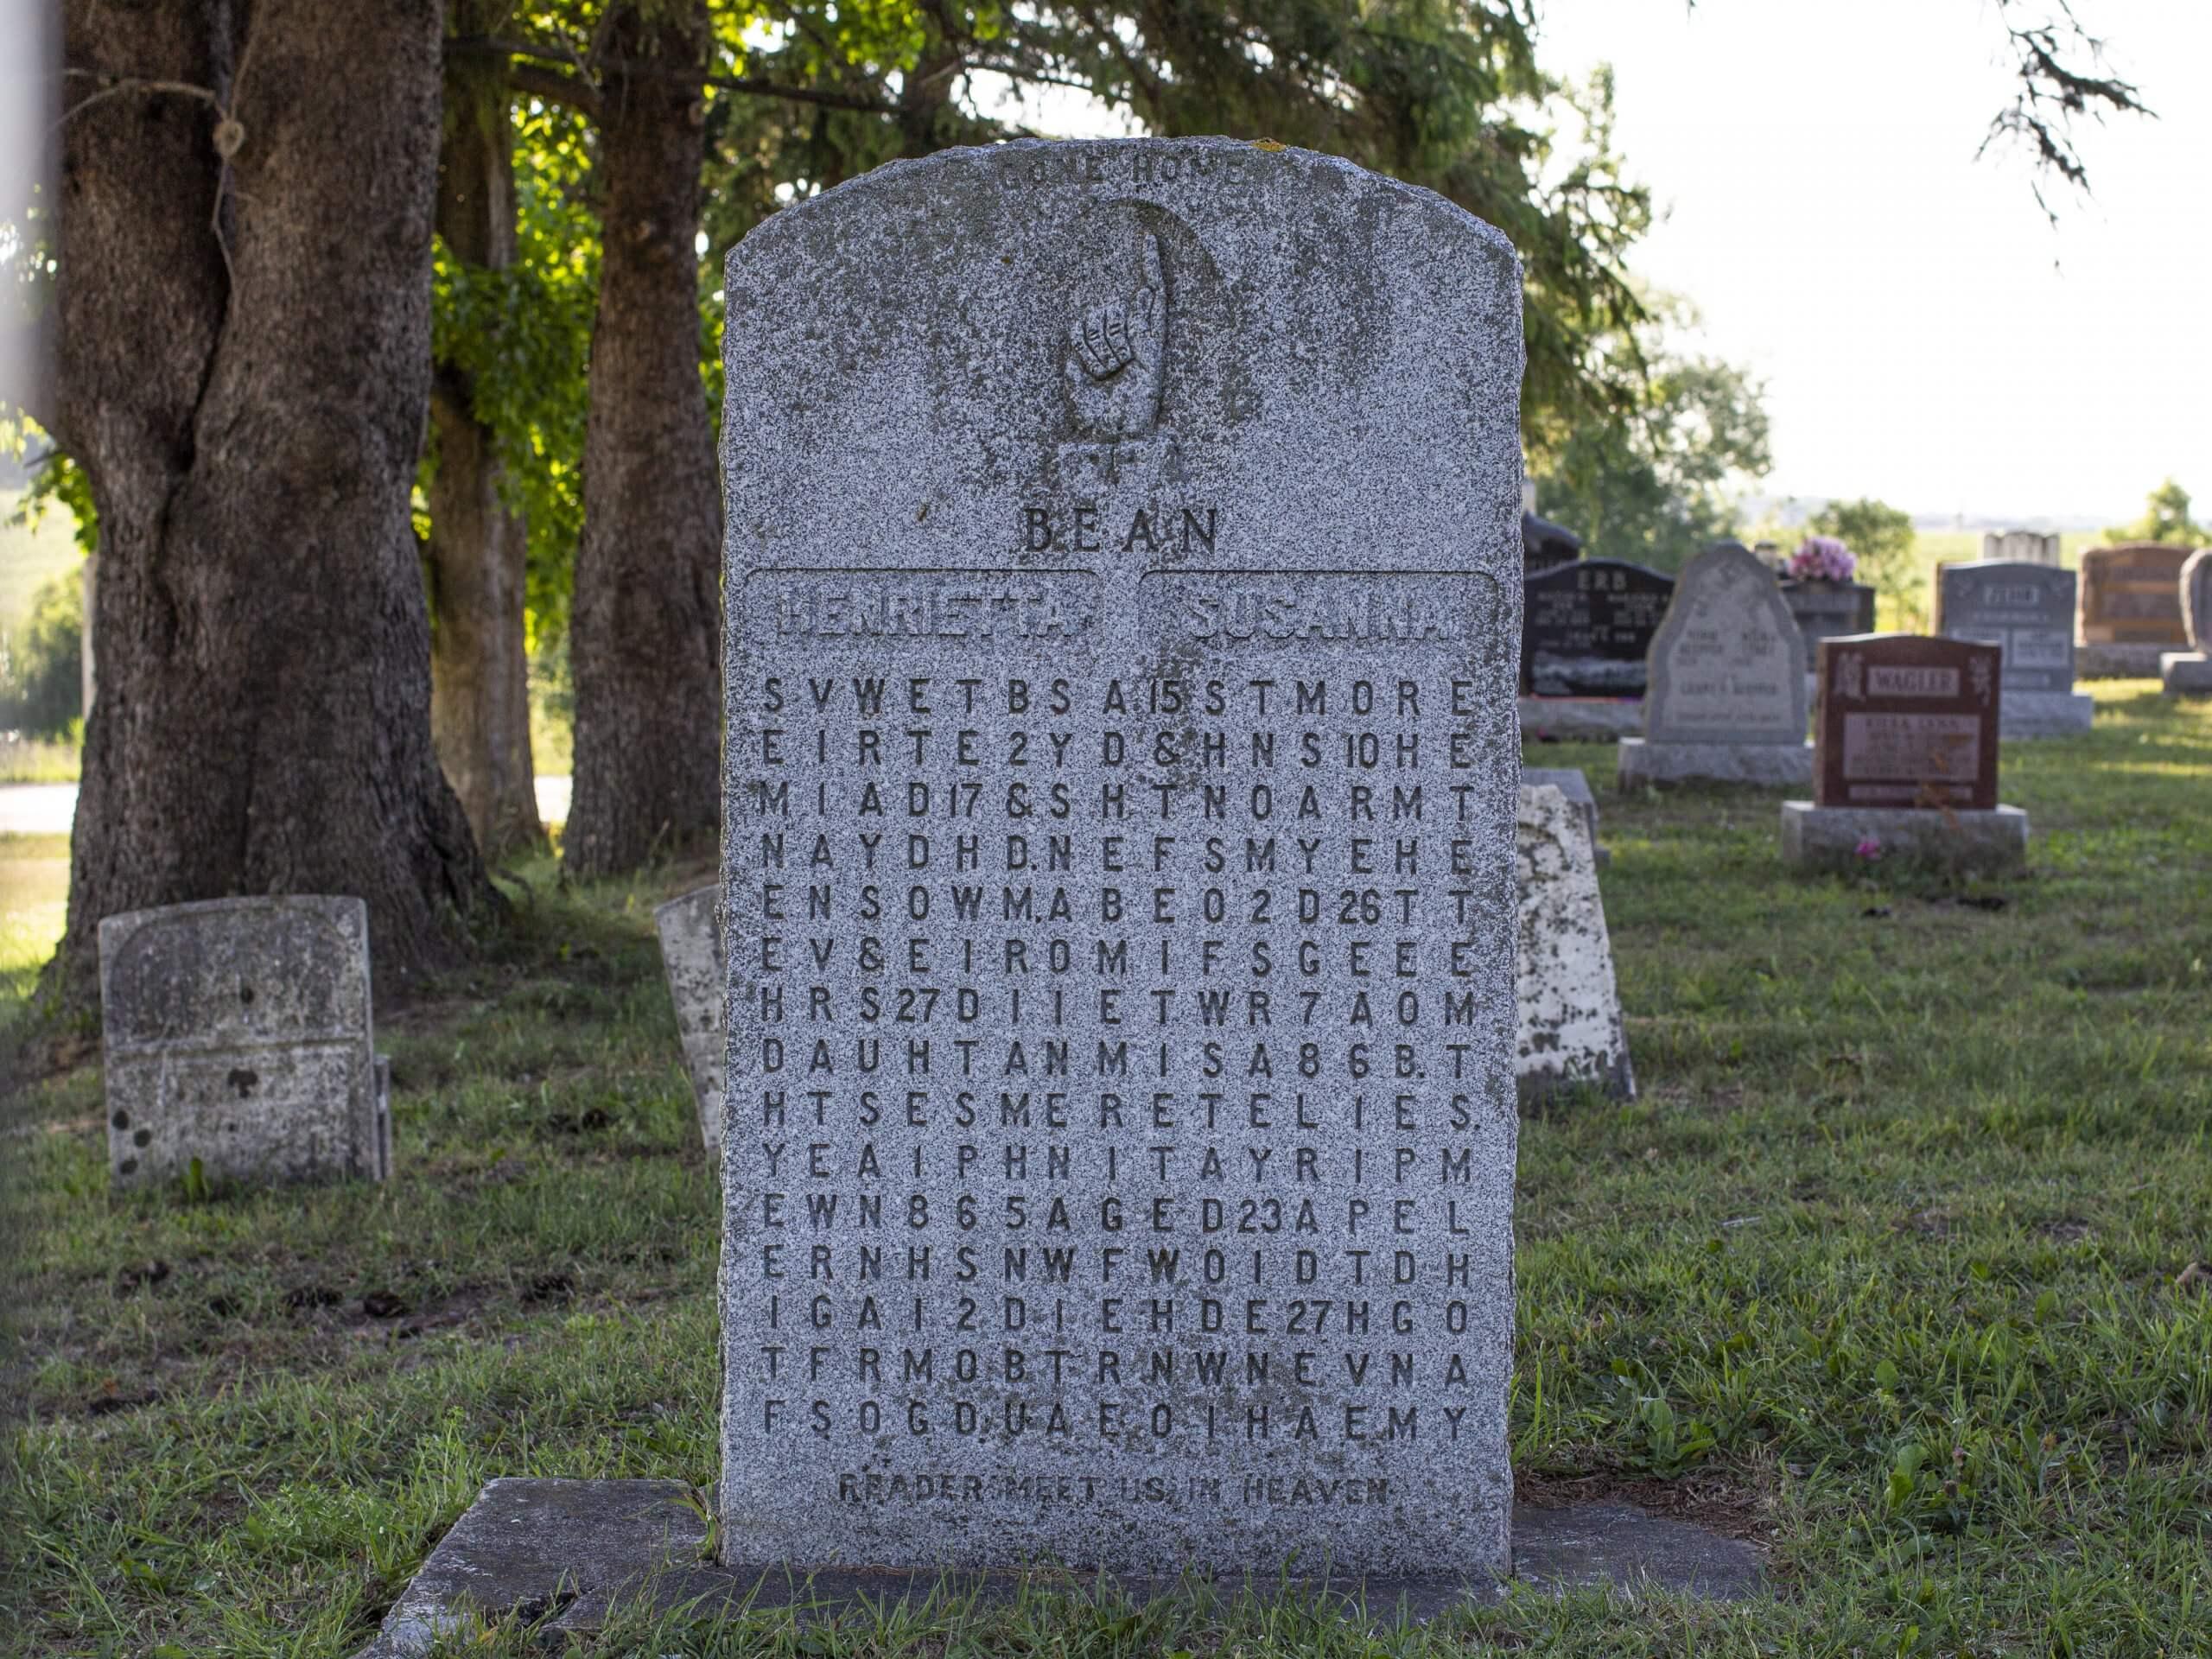 Samuel Bean 1982 Cryptic Gravestone